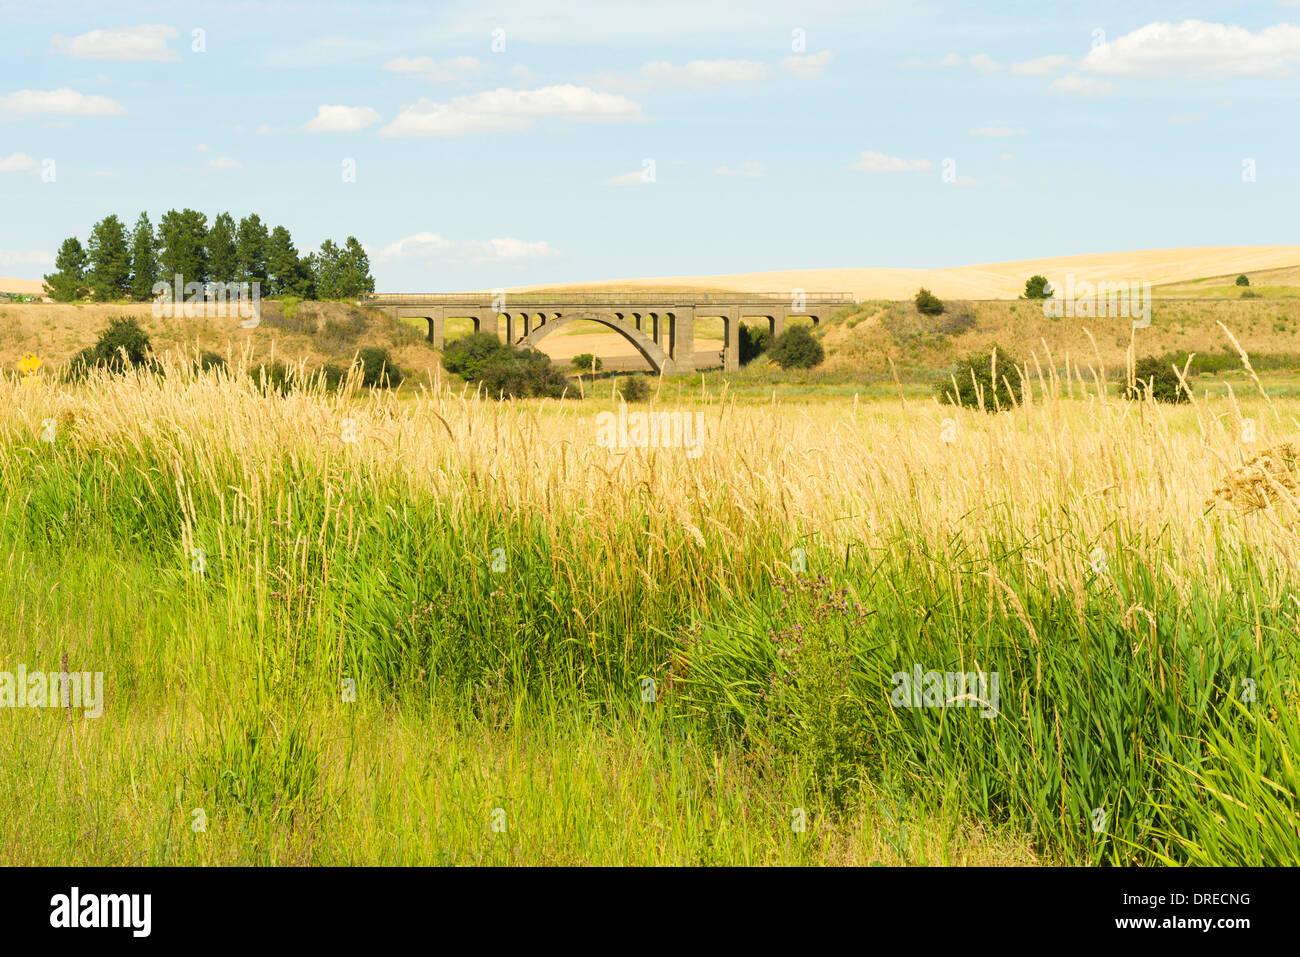 Eastern span of Rosalia Railroad Bridge (1915), near Rosalia, Washington, USA. - Stock Image